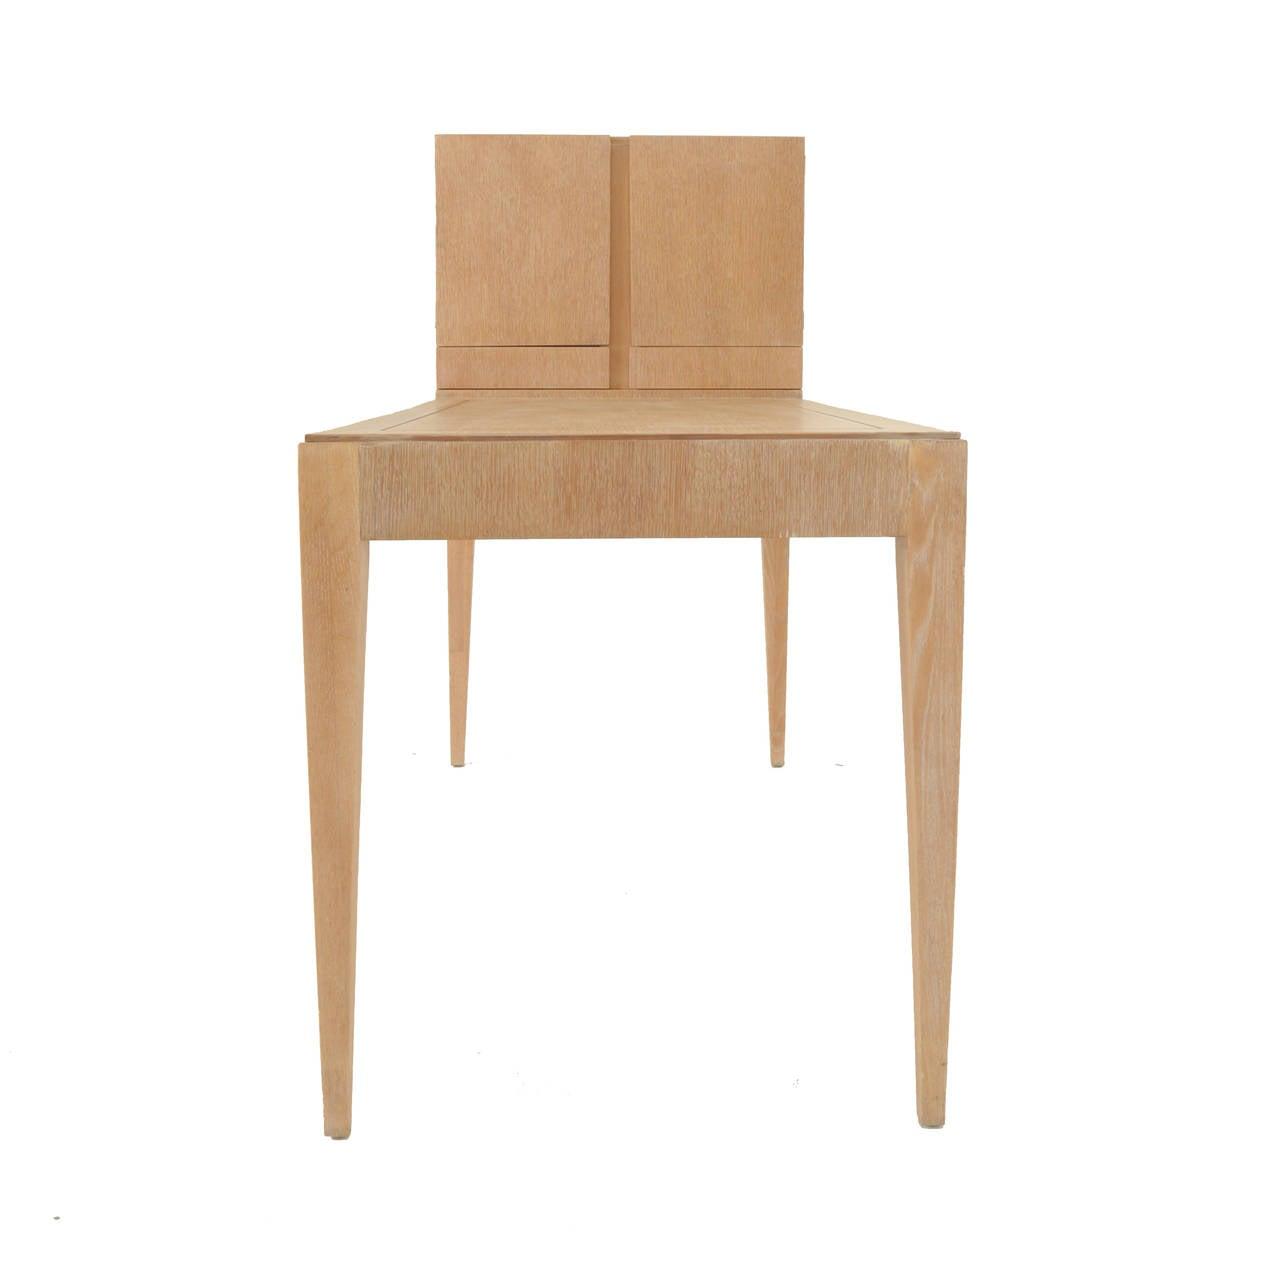 Mid-20th Century Oak Secretary Desk by Irwin with Letter Cabinet For Sale